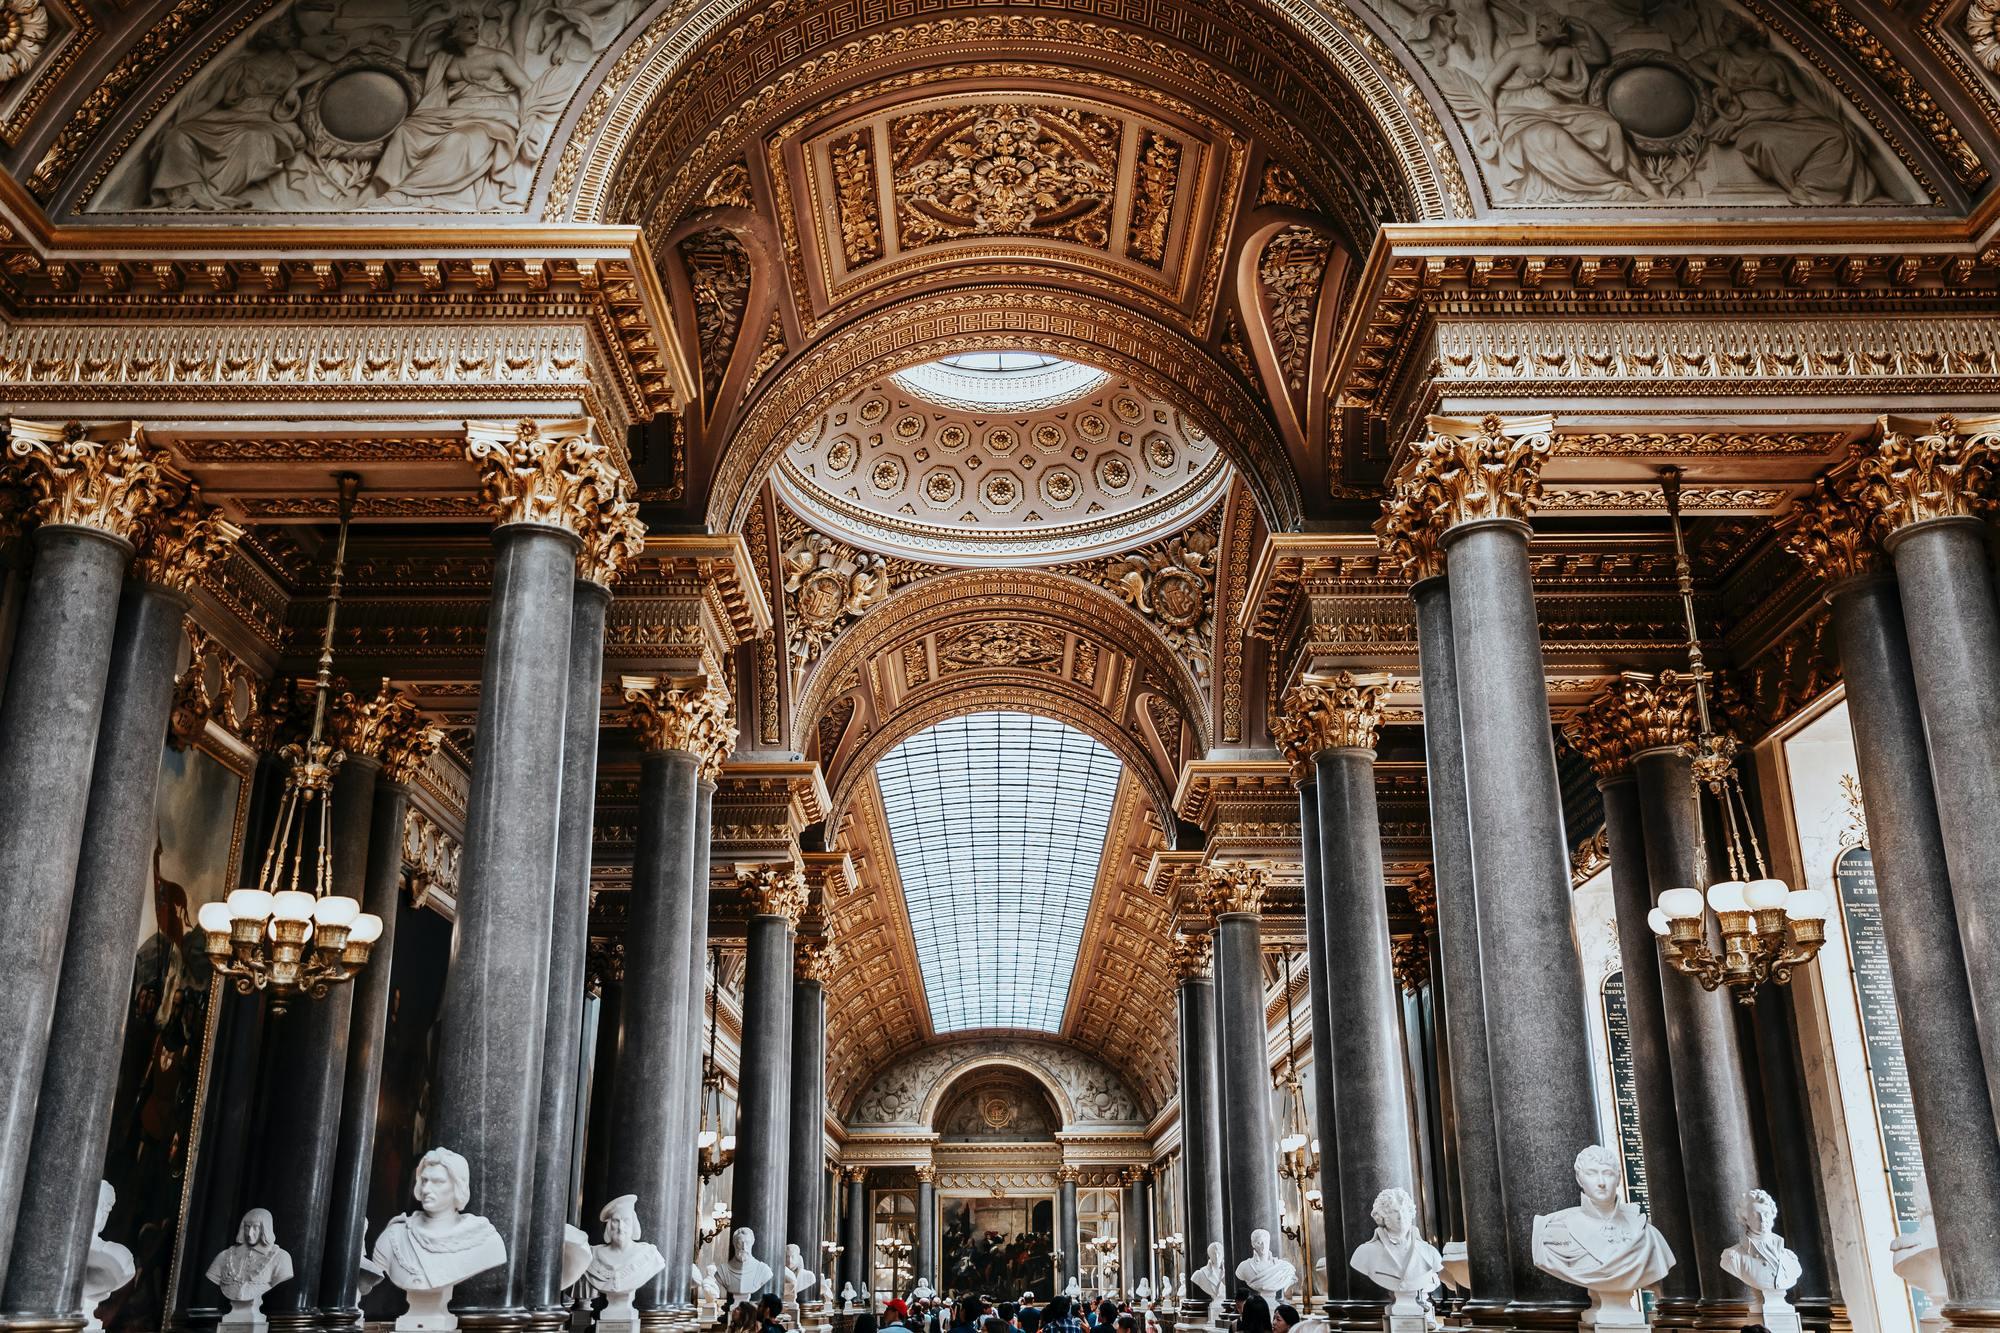 Exploring the Eccentric Decorations That Define Baroque Architecture